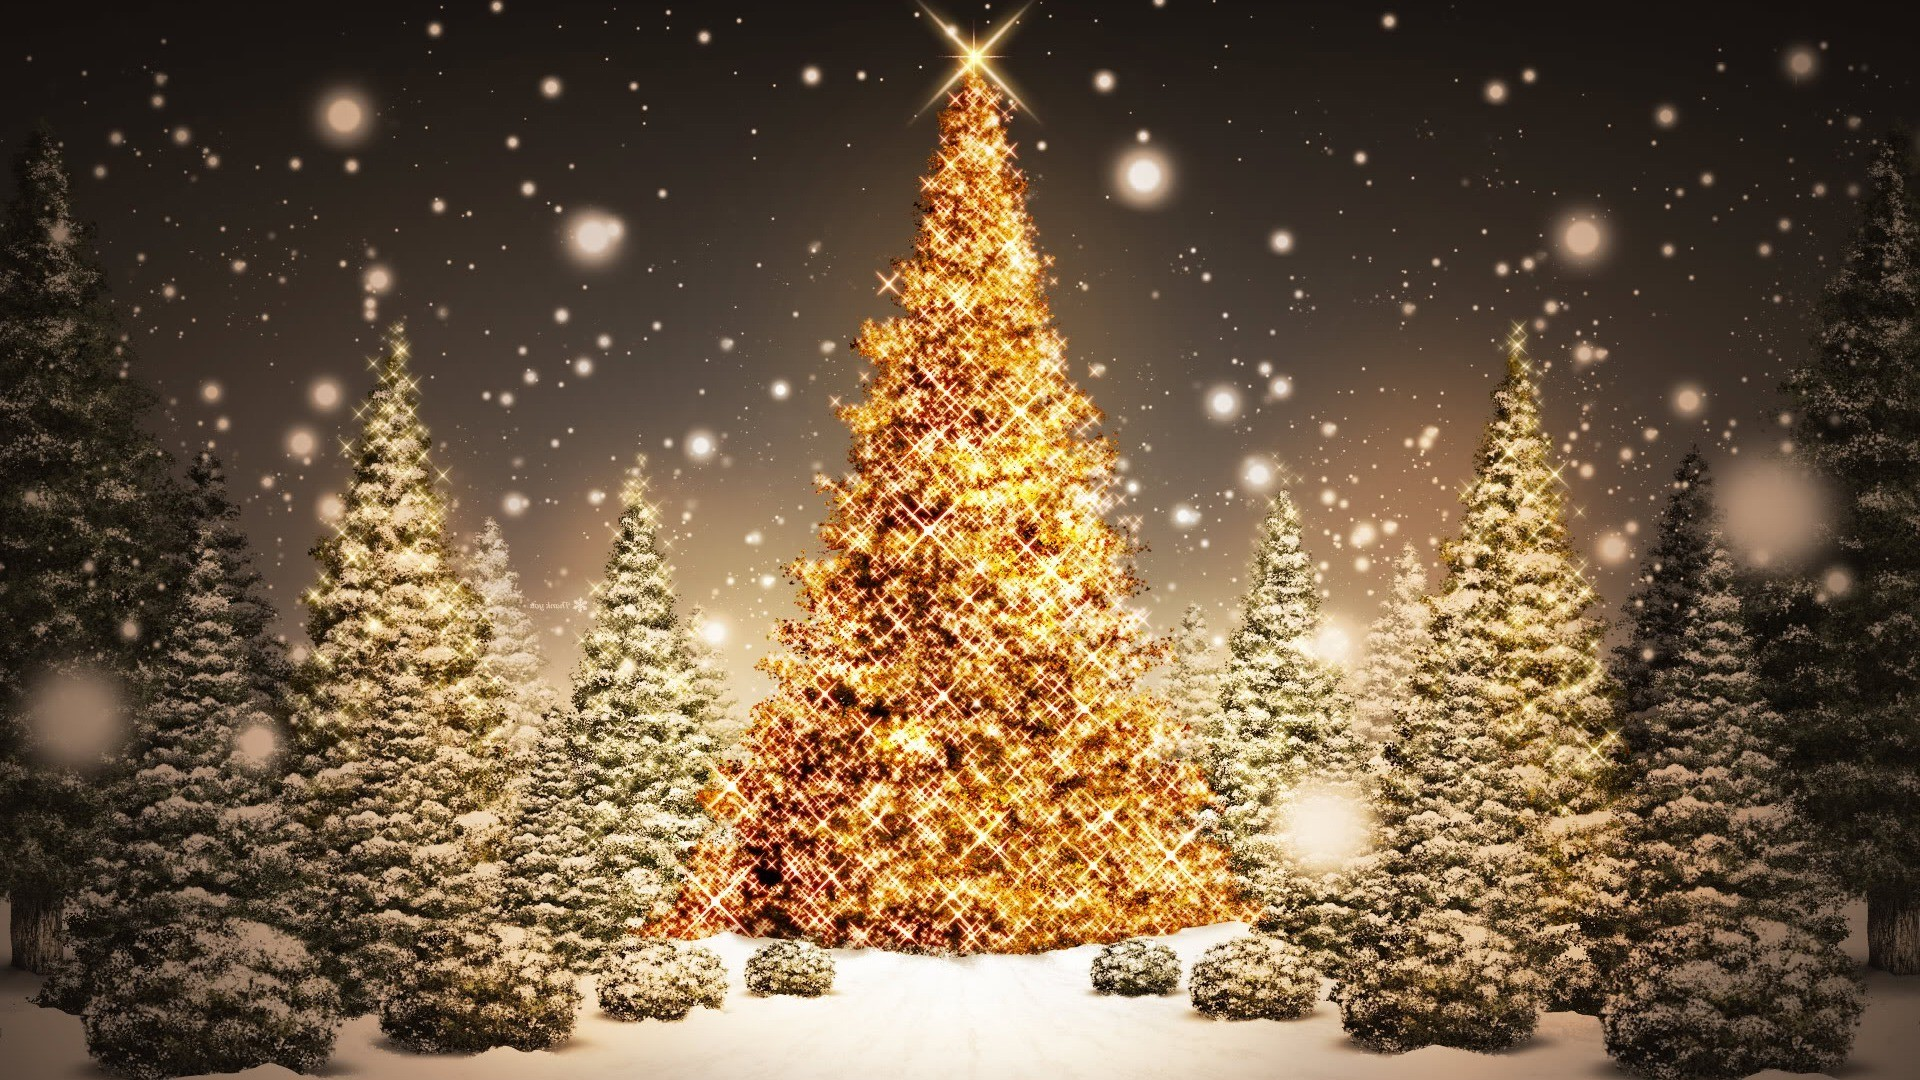 Christmas Tree HD Widescreen Wallpaper